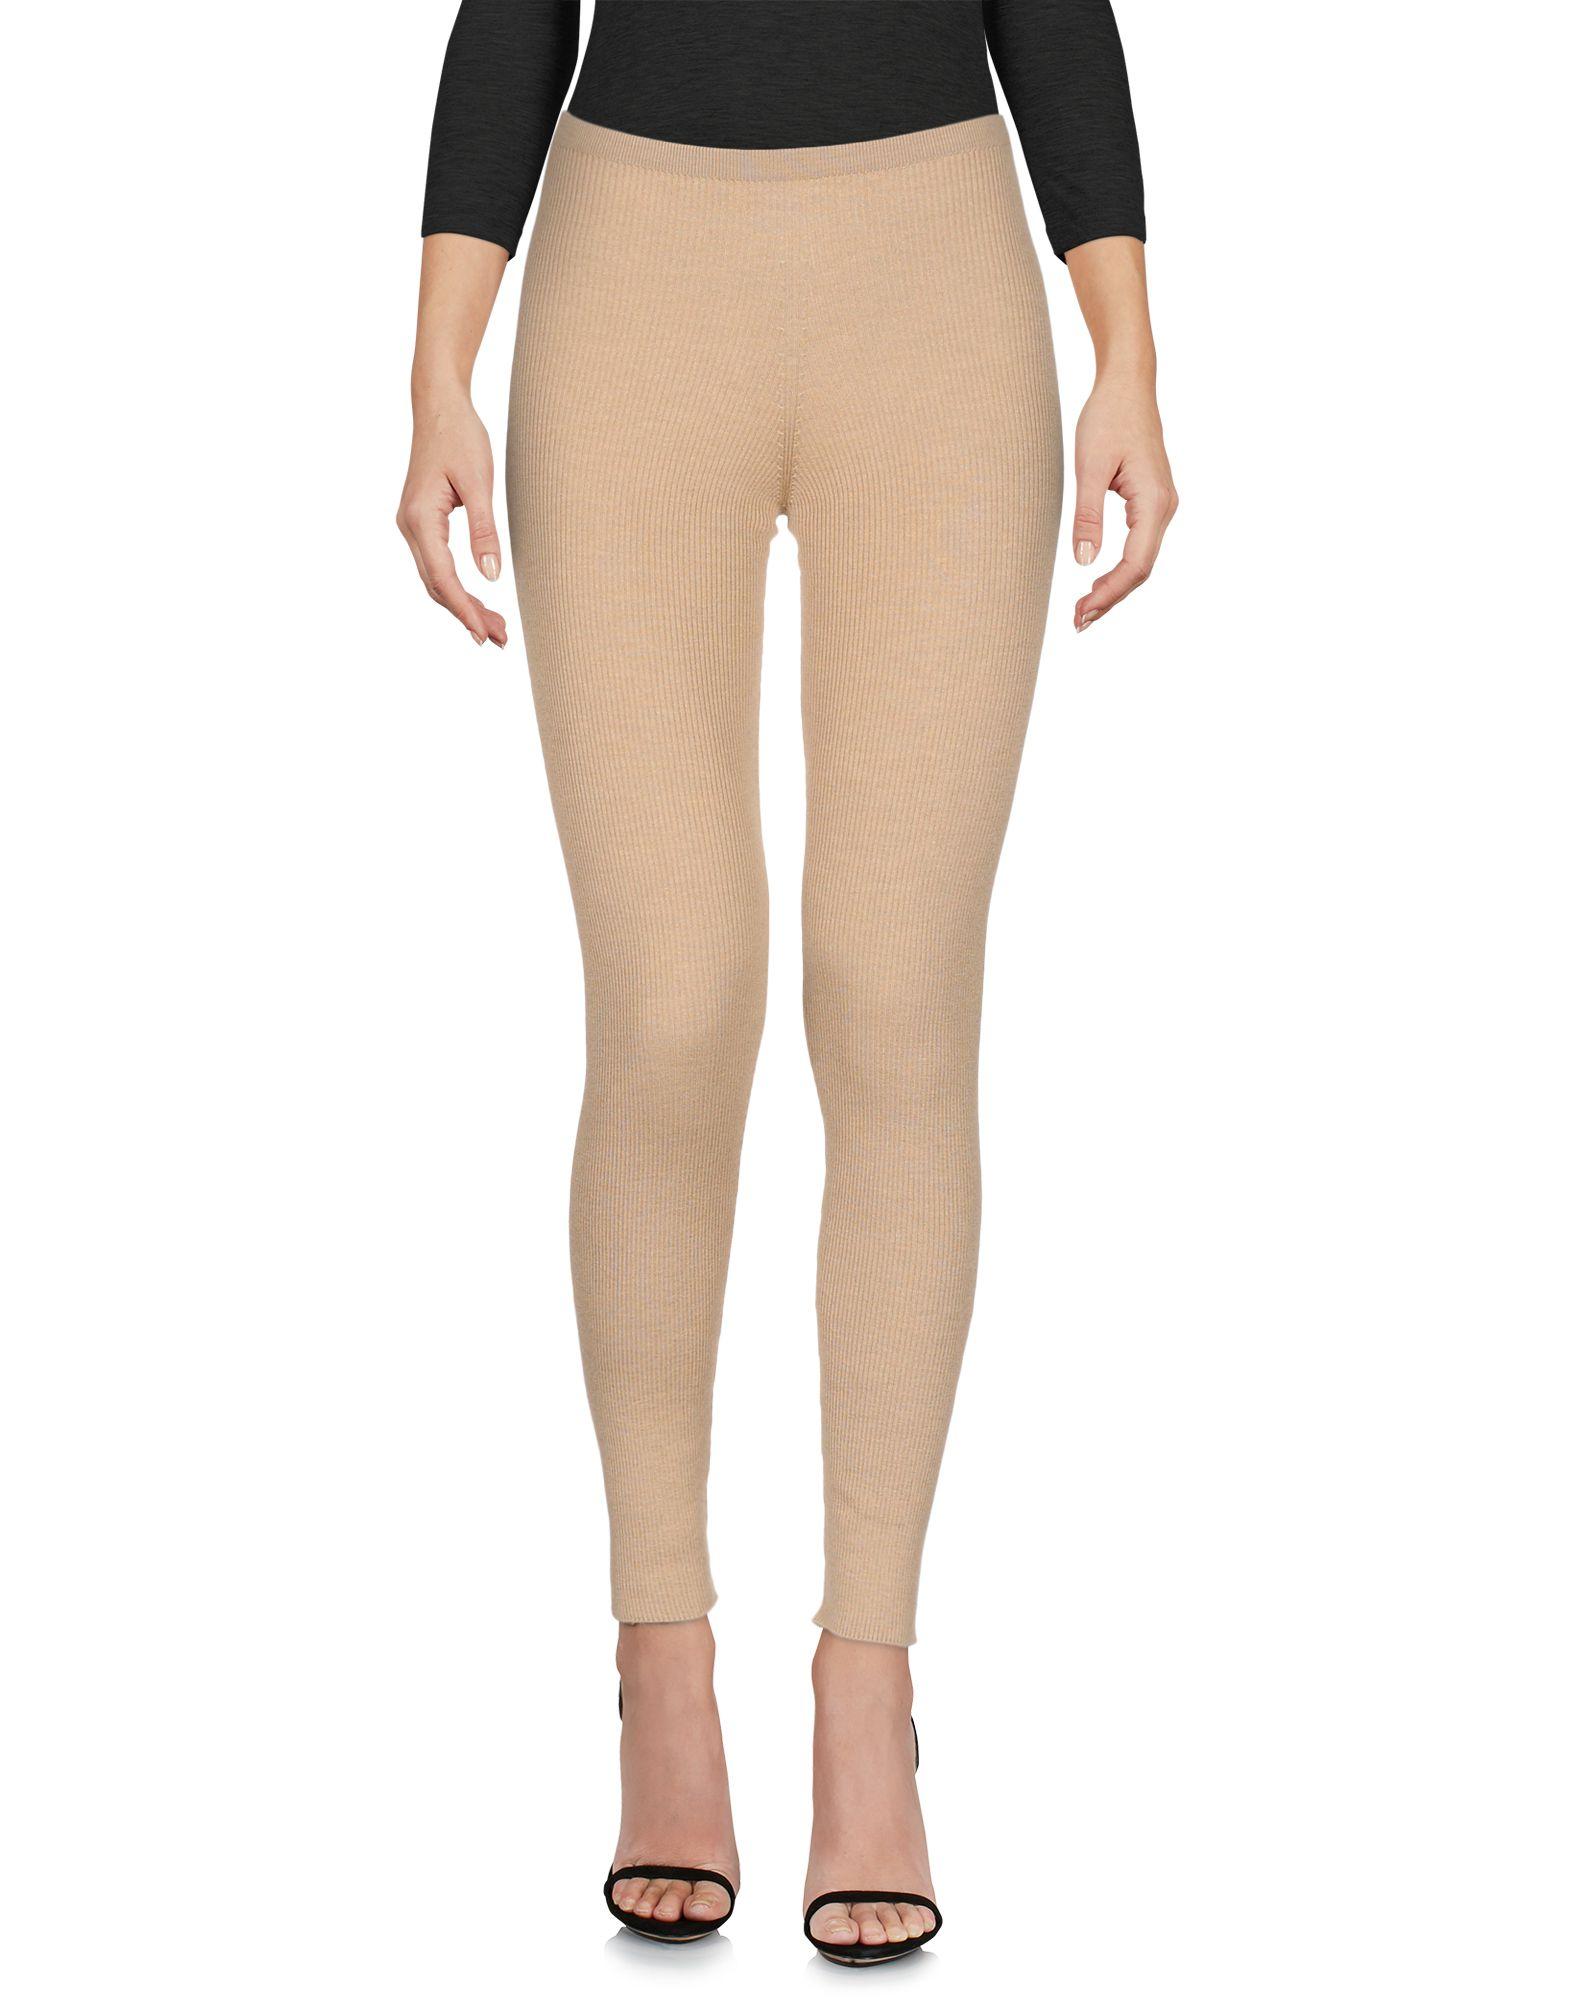 Leggings Colombo Donna - Acquista online su TajwMguCj